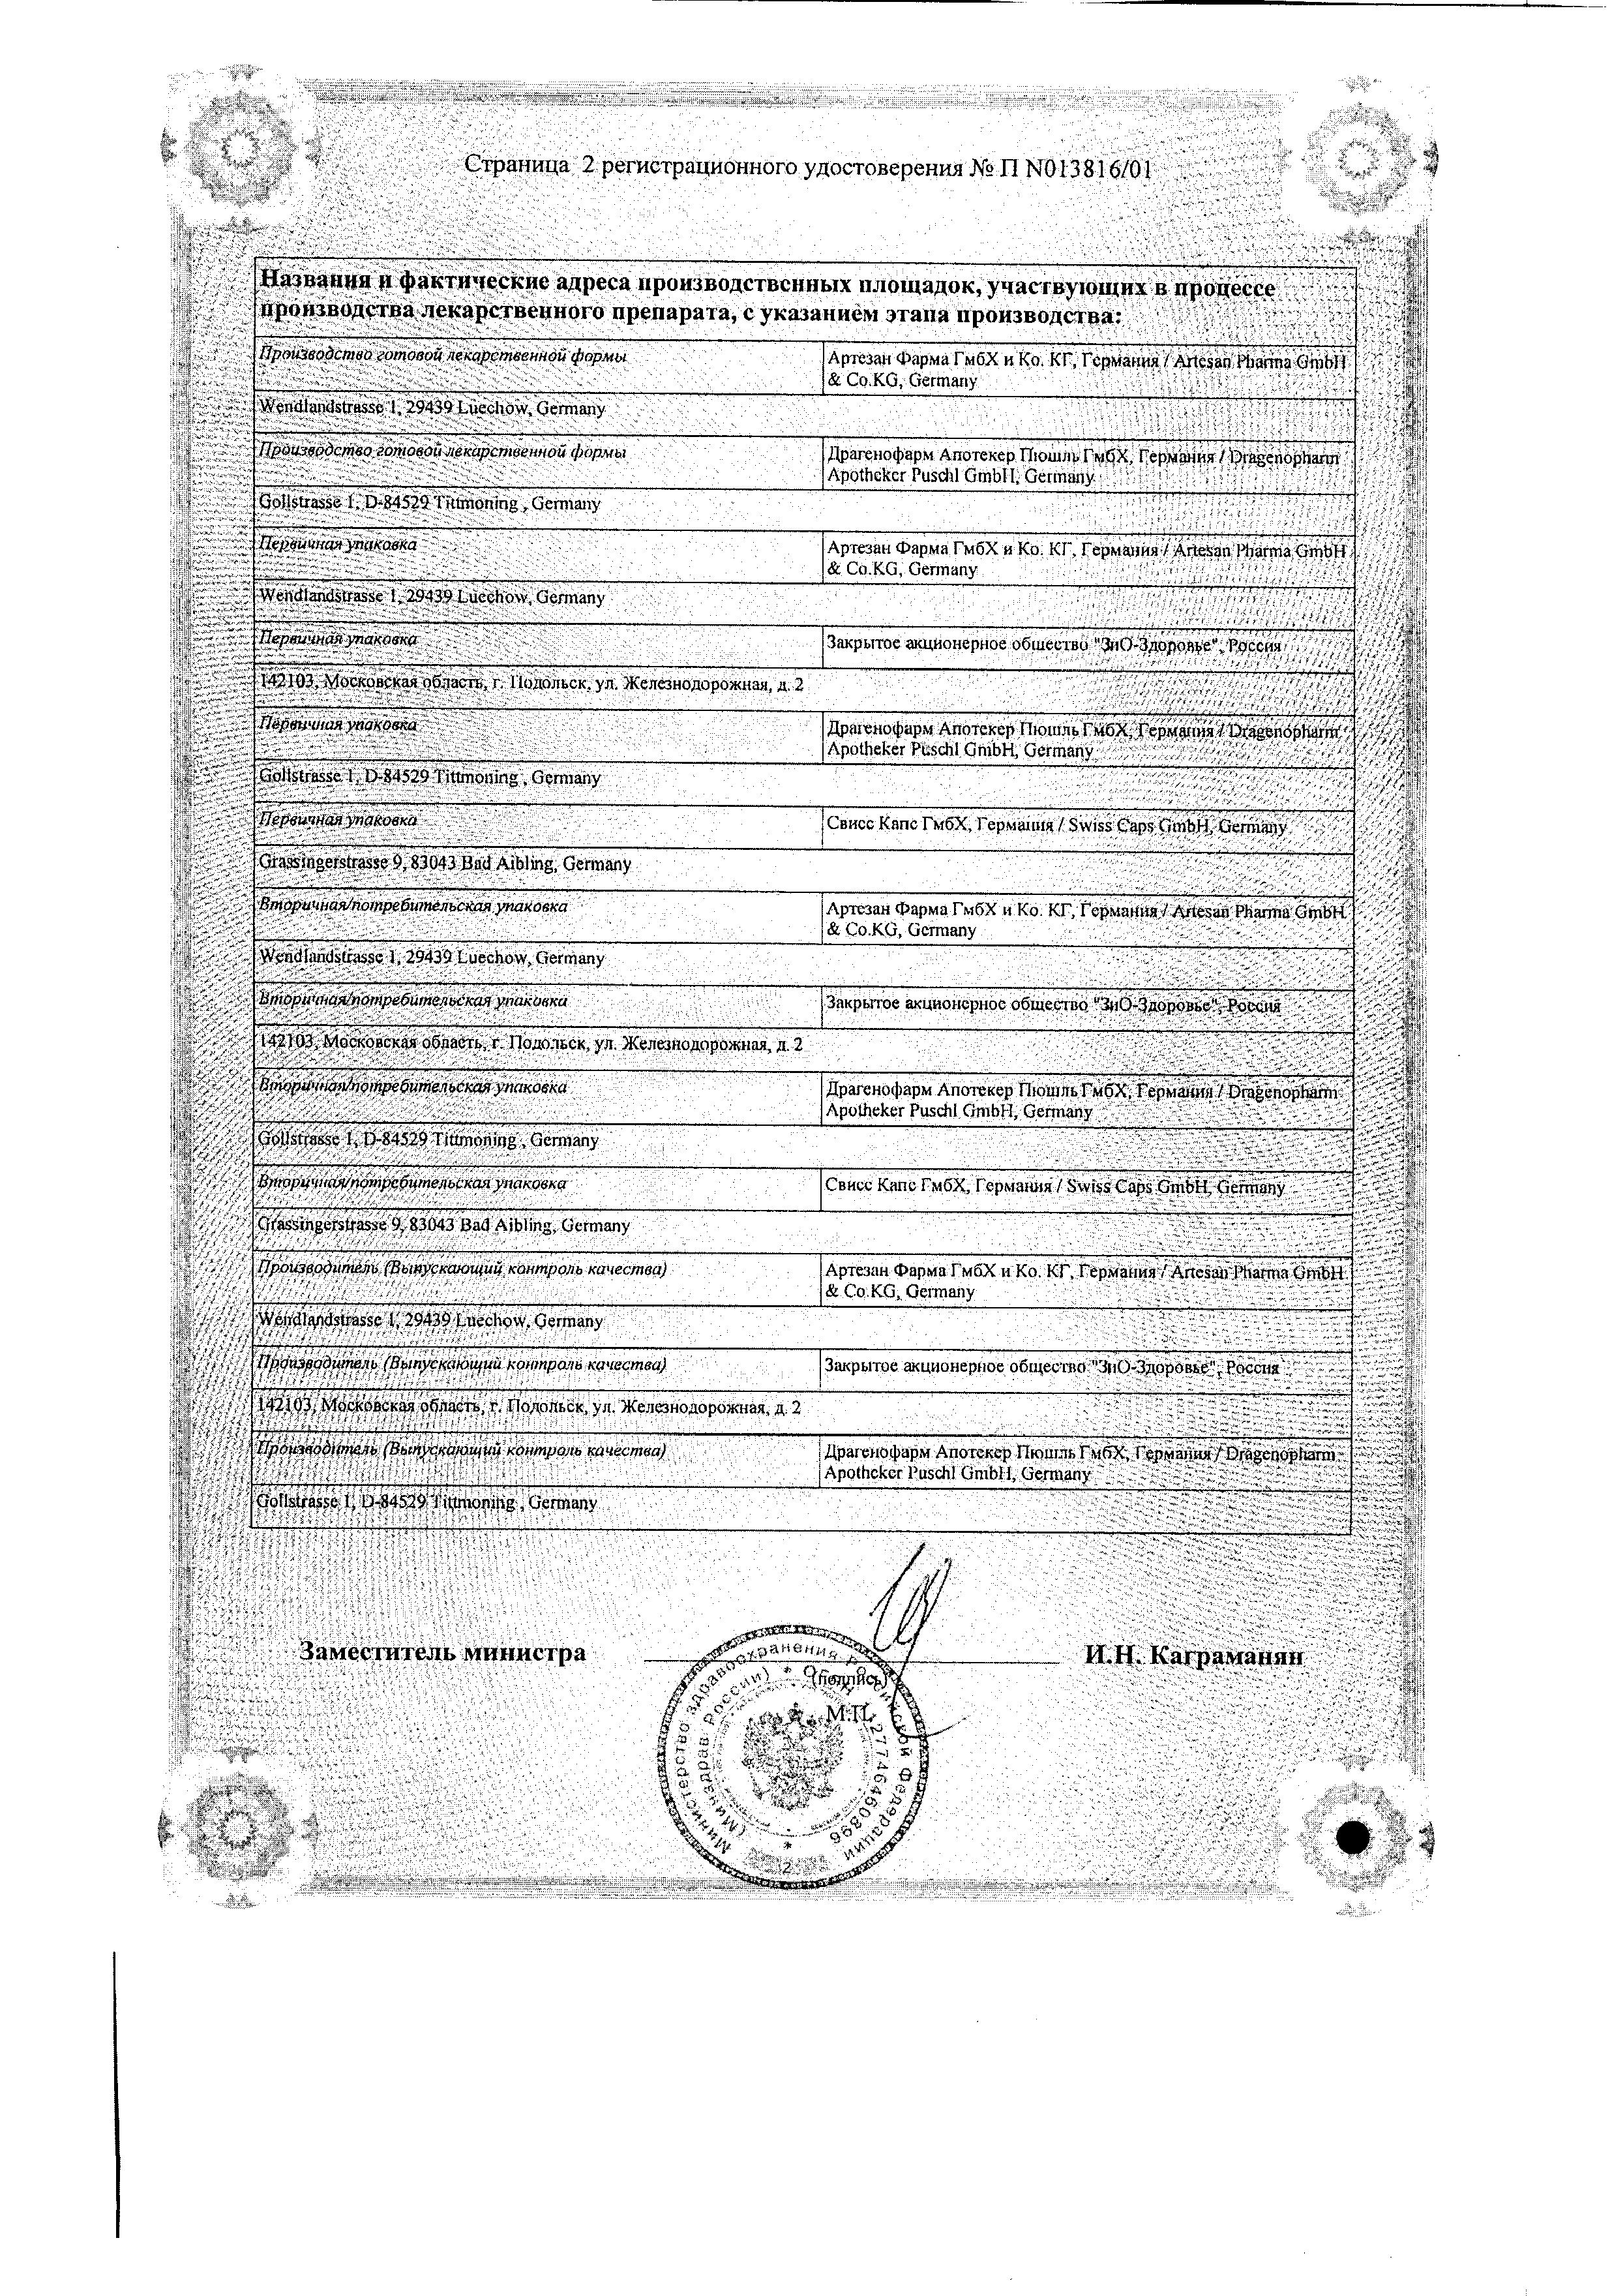 Метфогамма 850 сертификат